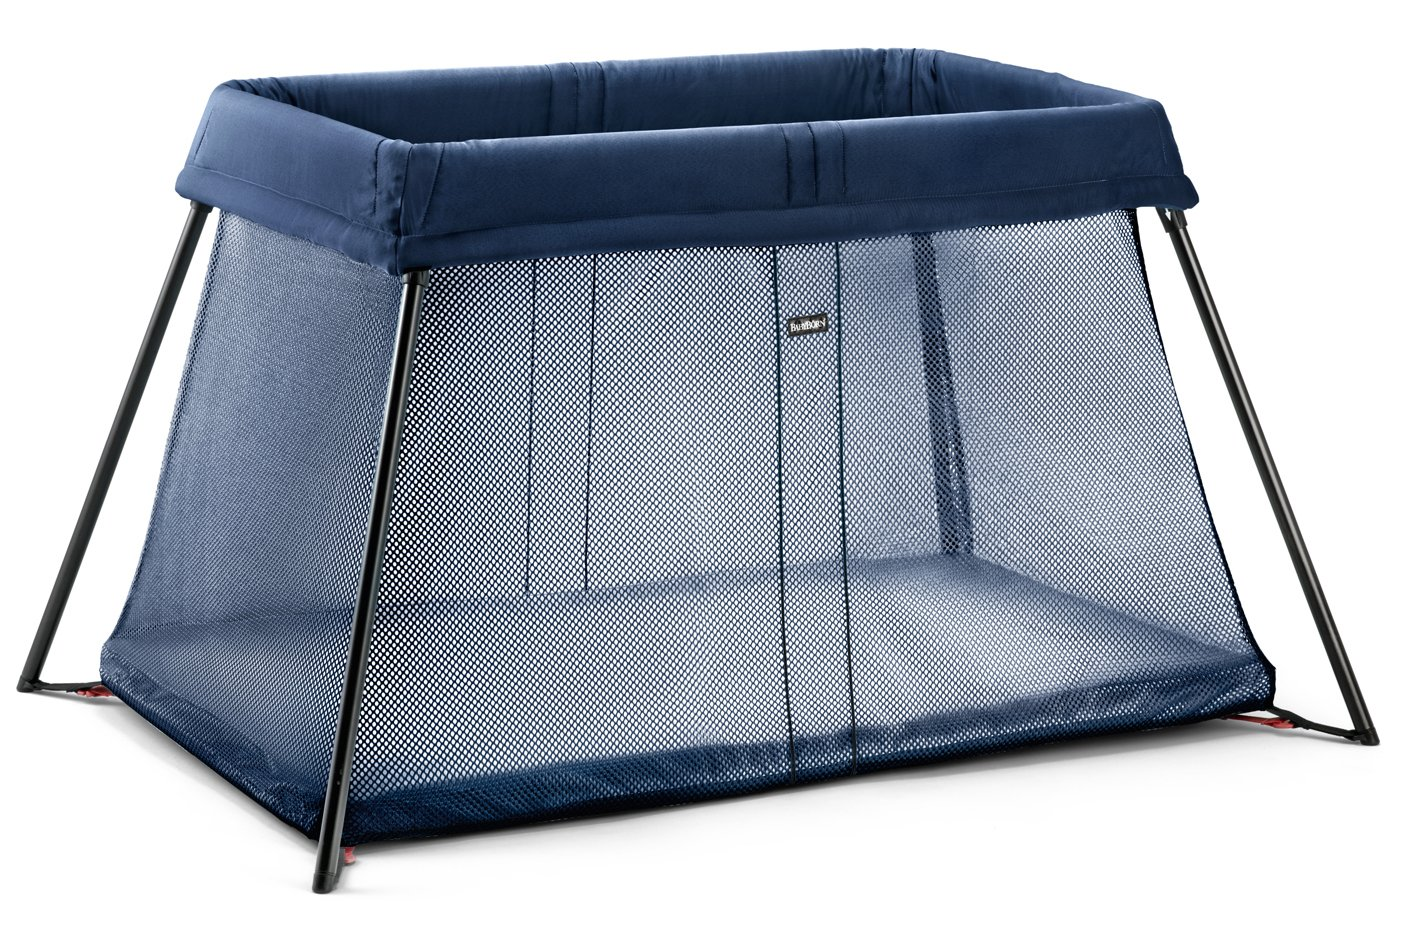 BABYBJORN Travel Crib Light - Great Blue